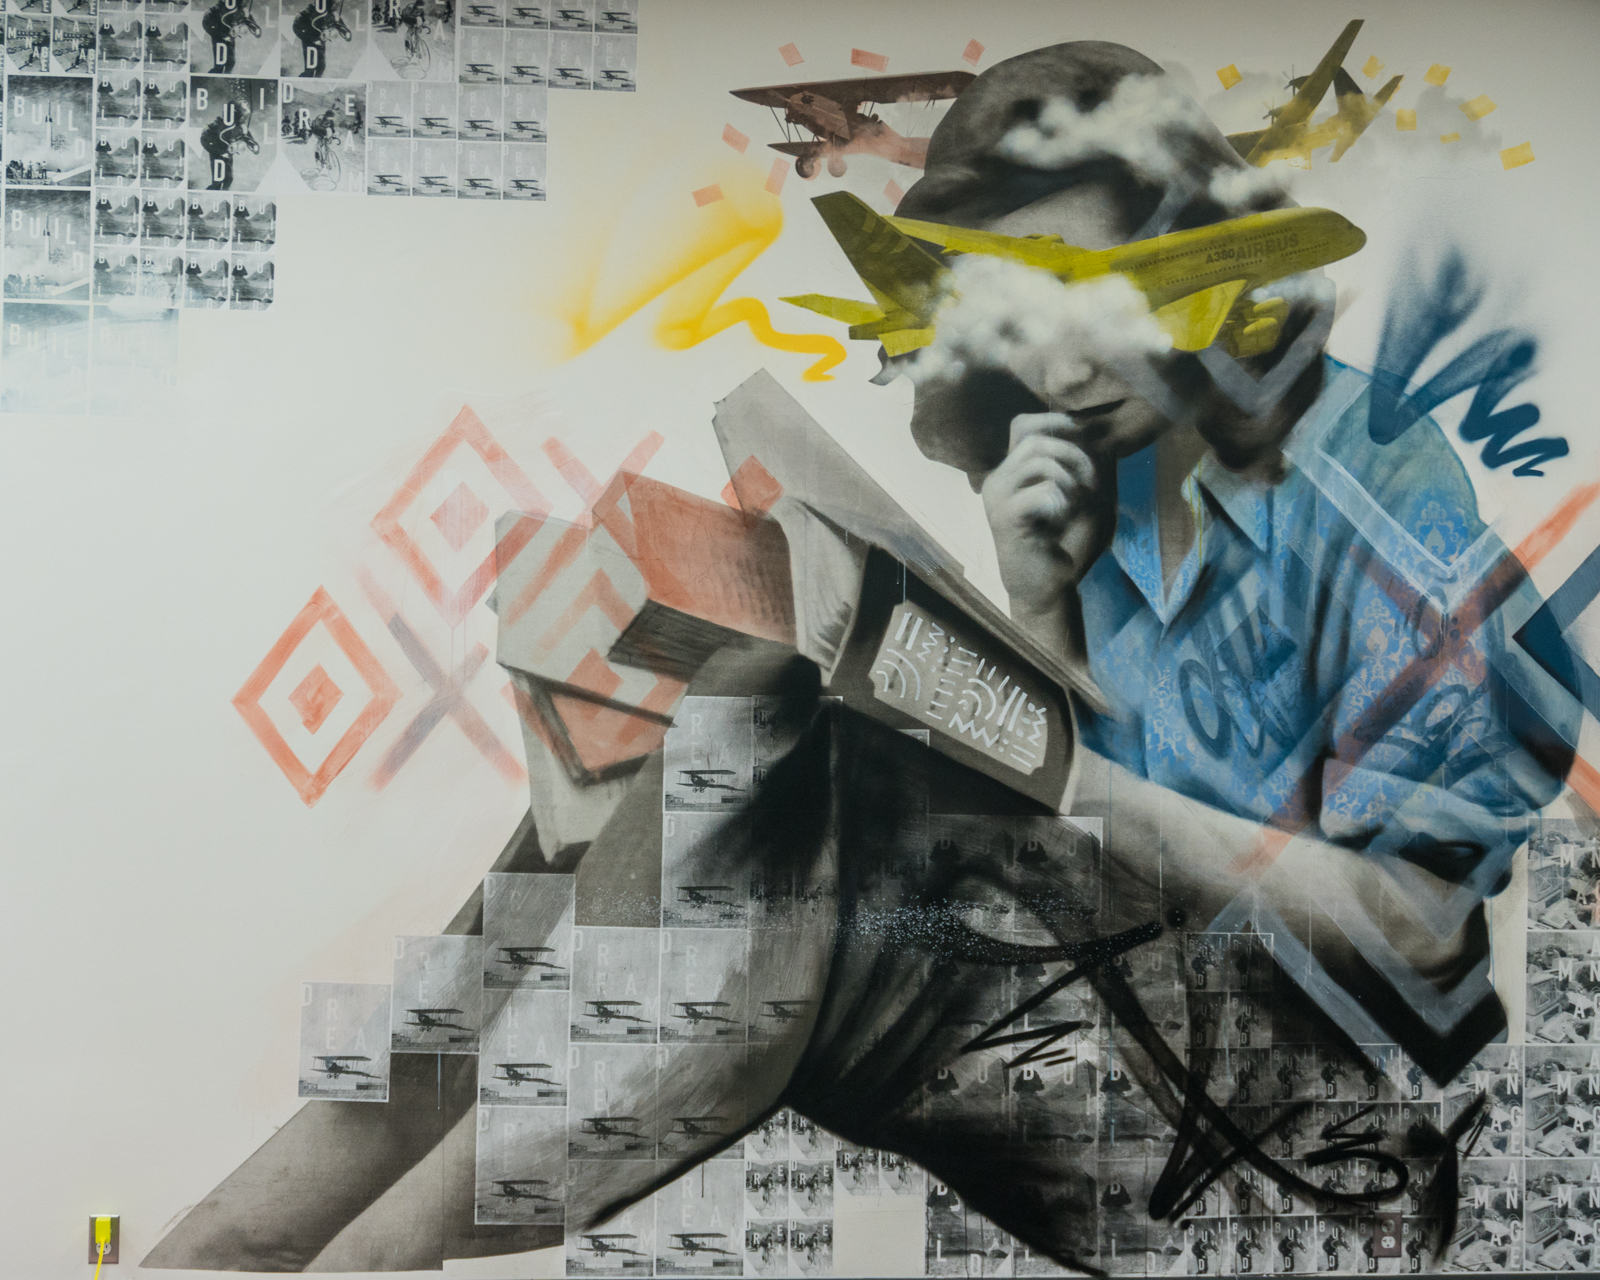 Wetiko Vltrr collaboration mural